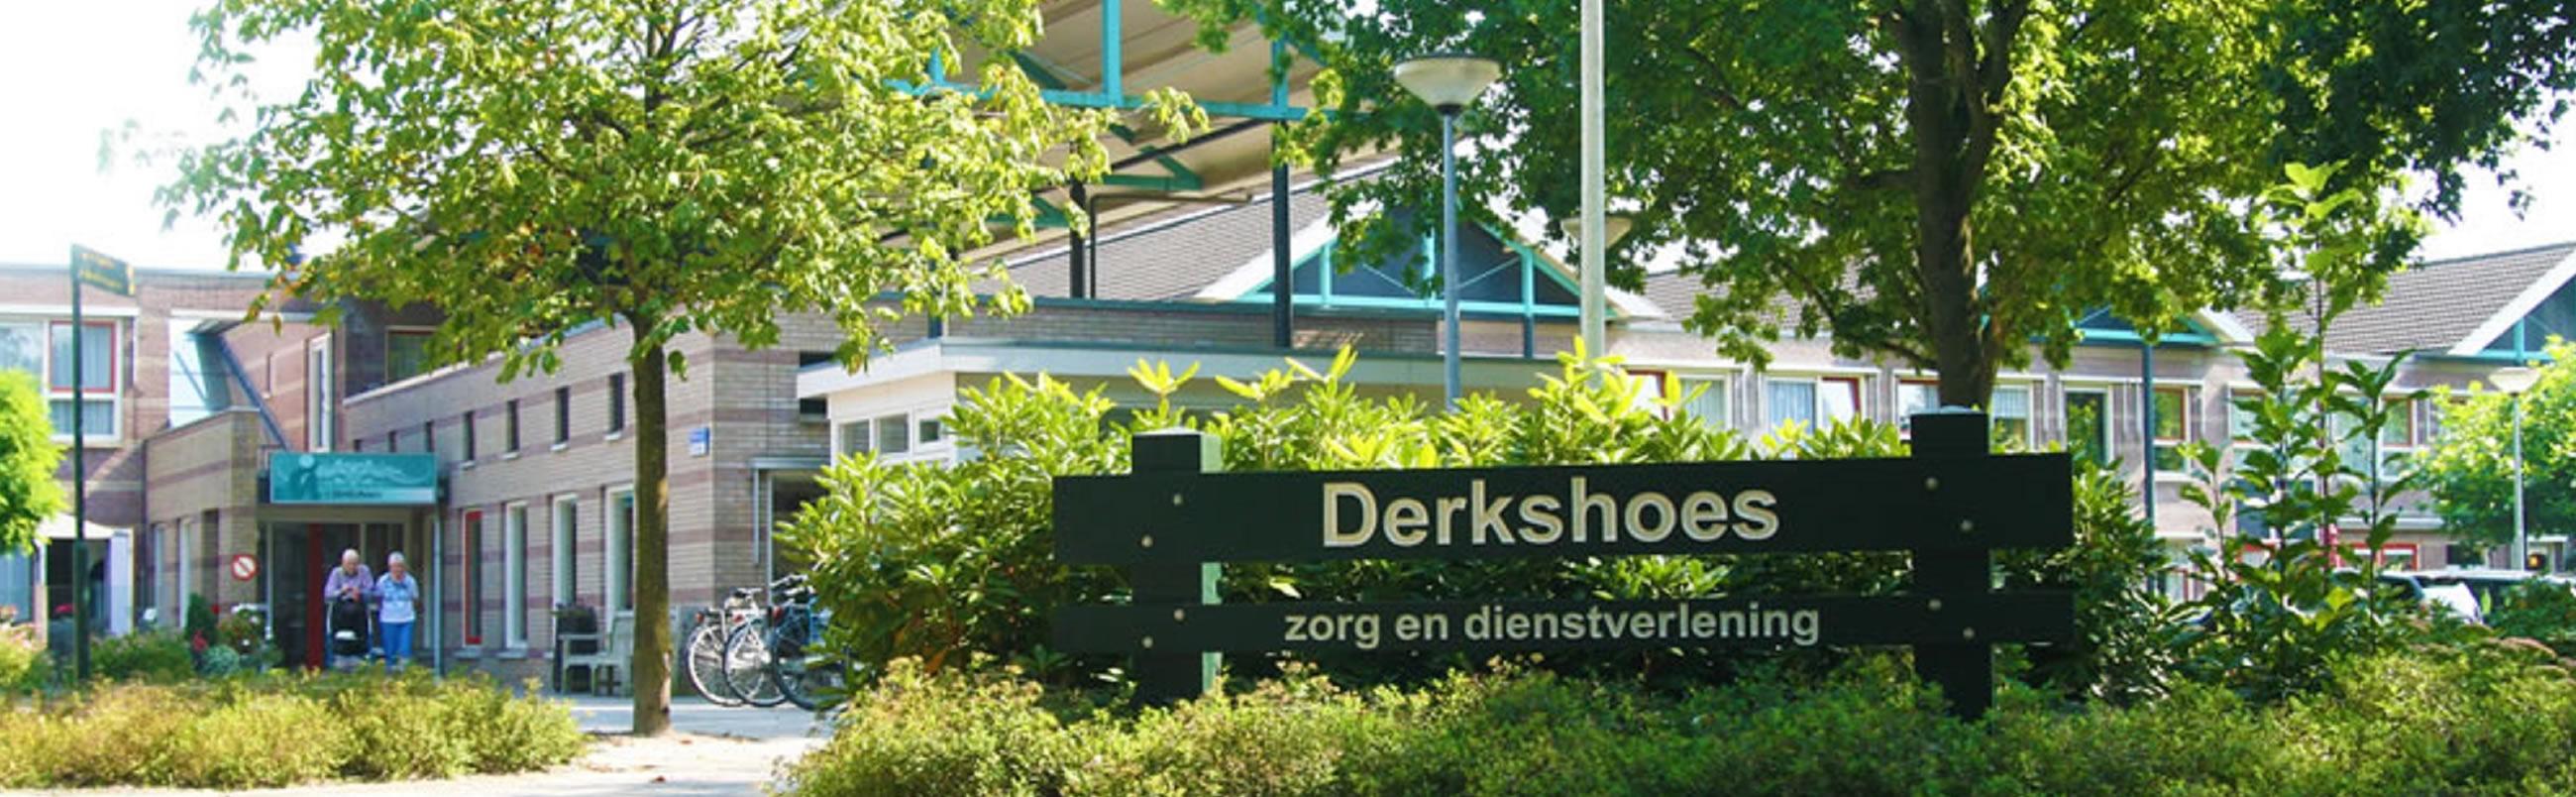 Woonzorgcentrum Drenthe